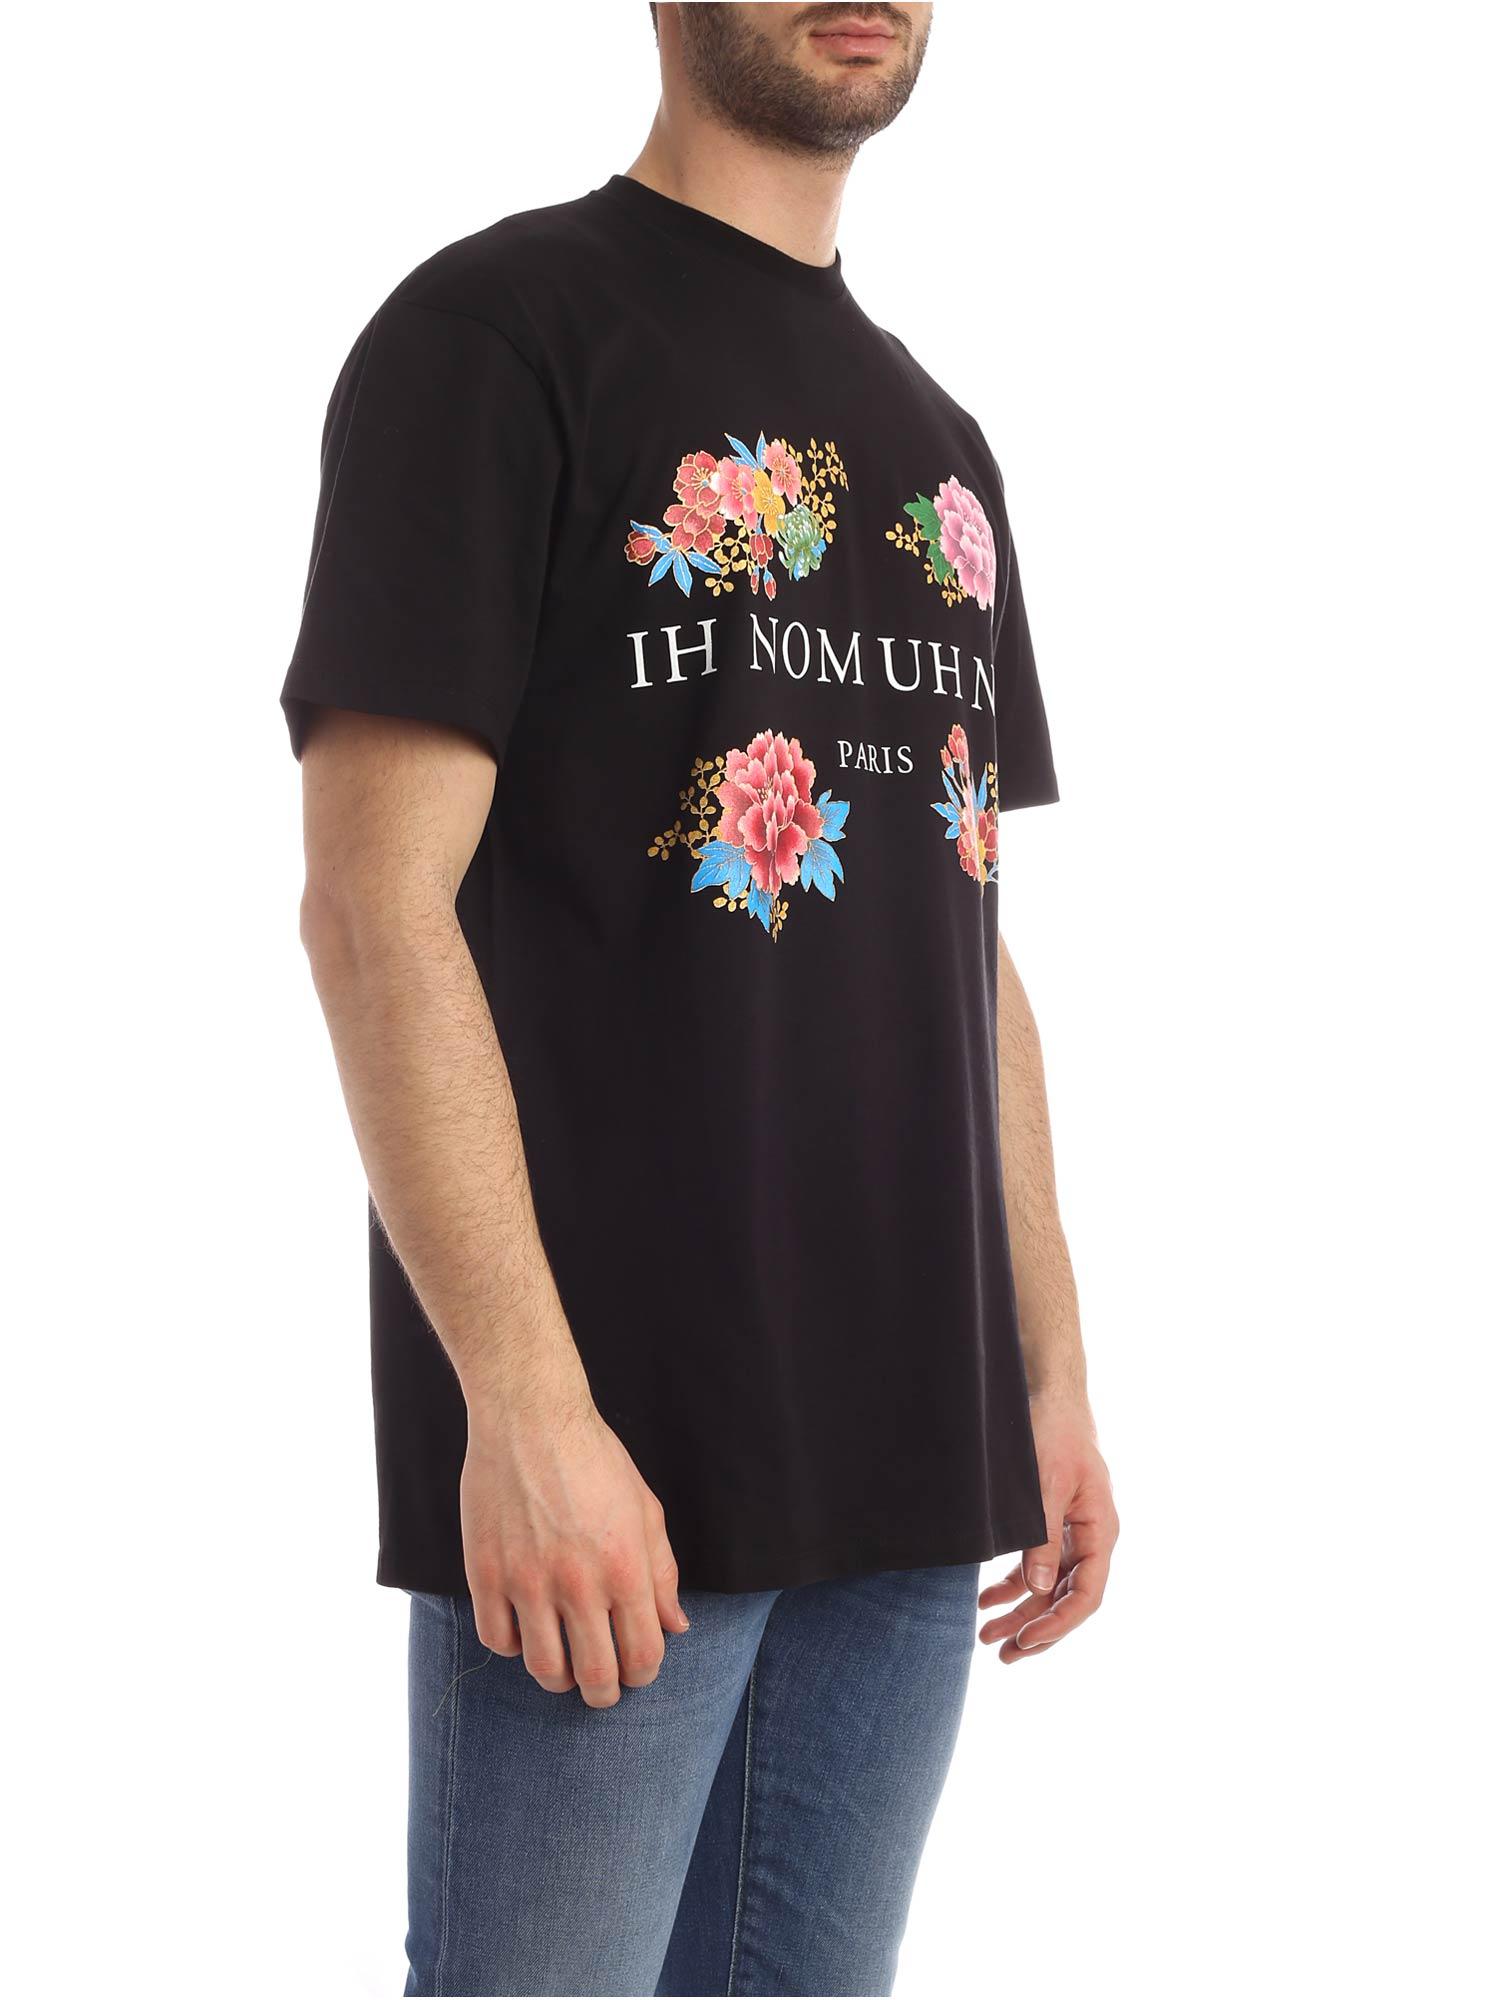 Immagine di Ih Nom Uh Nit | T-Shirt Flowery Print